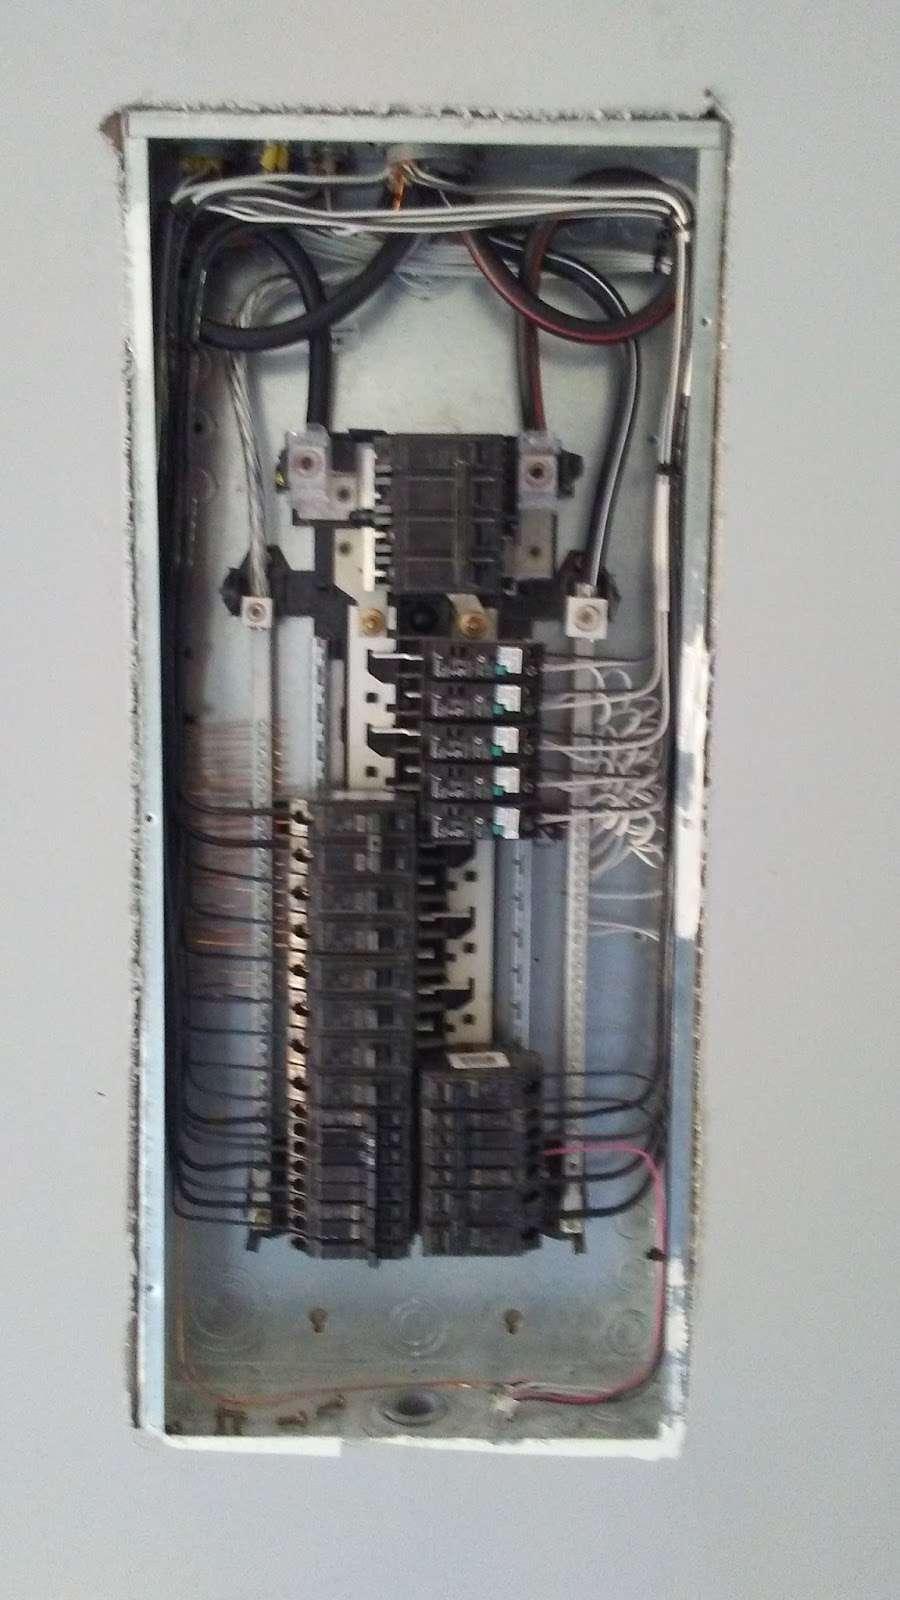 Clark Electric - electrician  | Photo 2 of 10 | Address: 1504 Riverside Rd, Lancaster, SC 29720, USA | Phone: (803) 246-9675